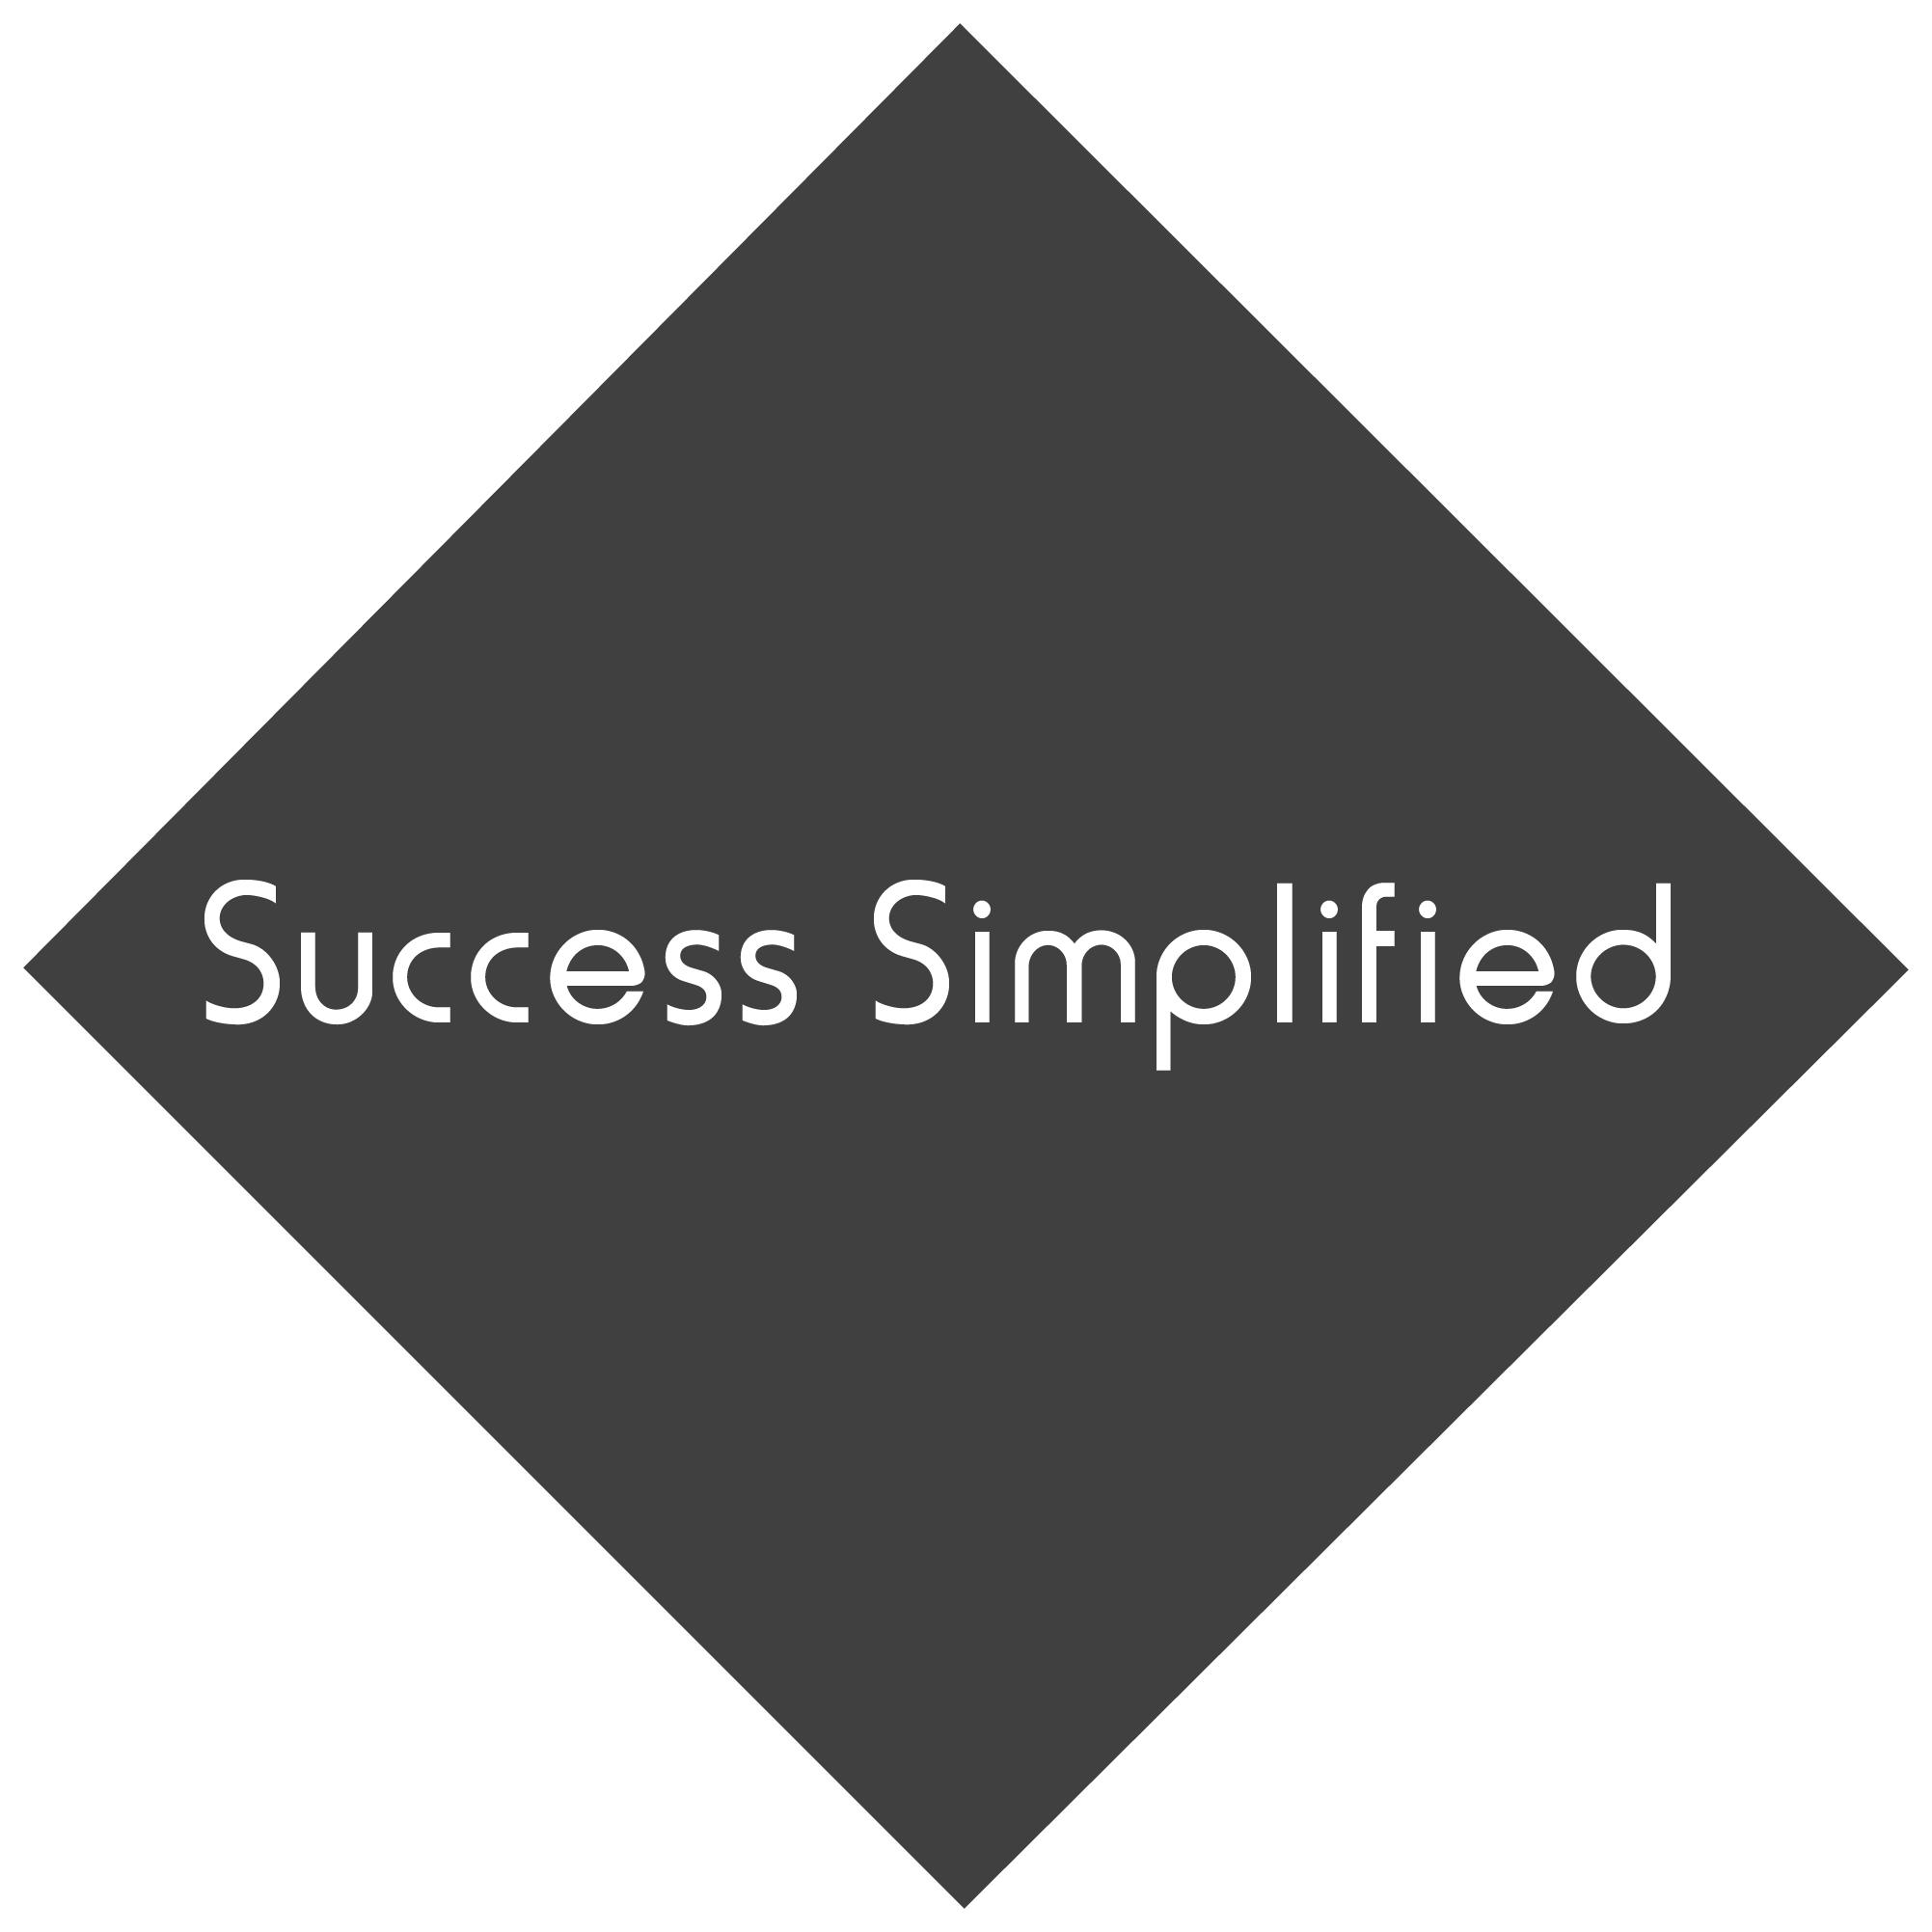 Heardat-bannerSuccess Simplified-100op Grey block 2002